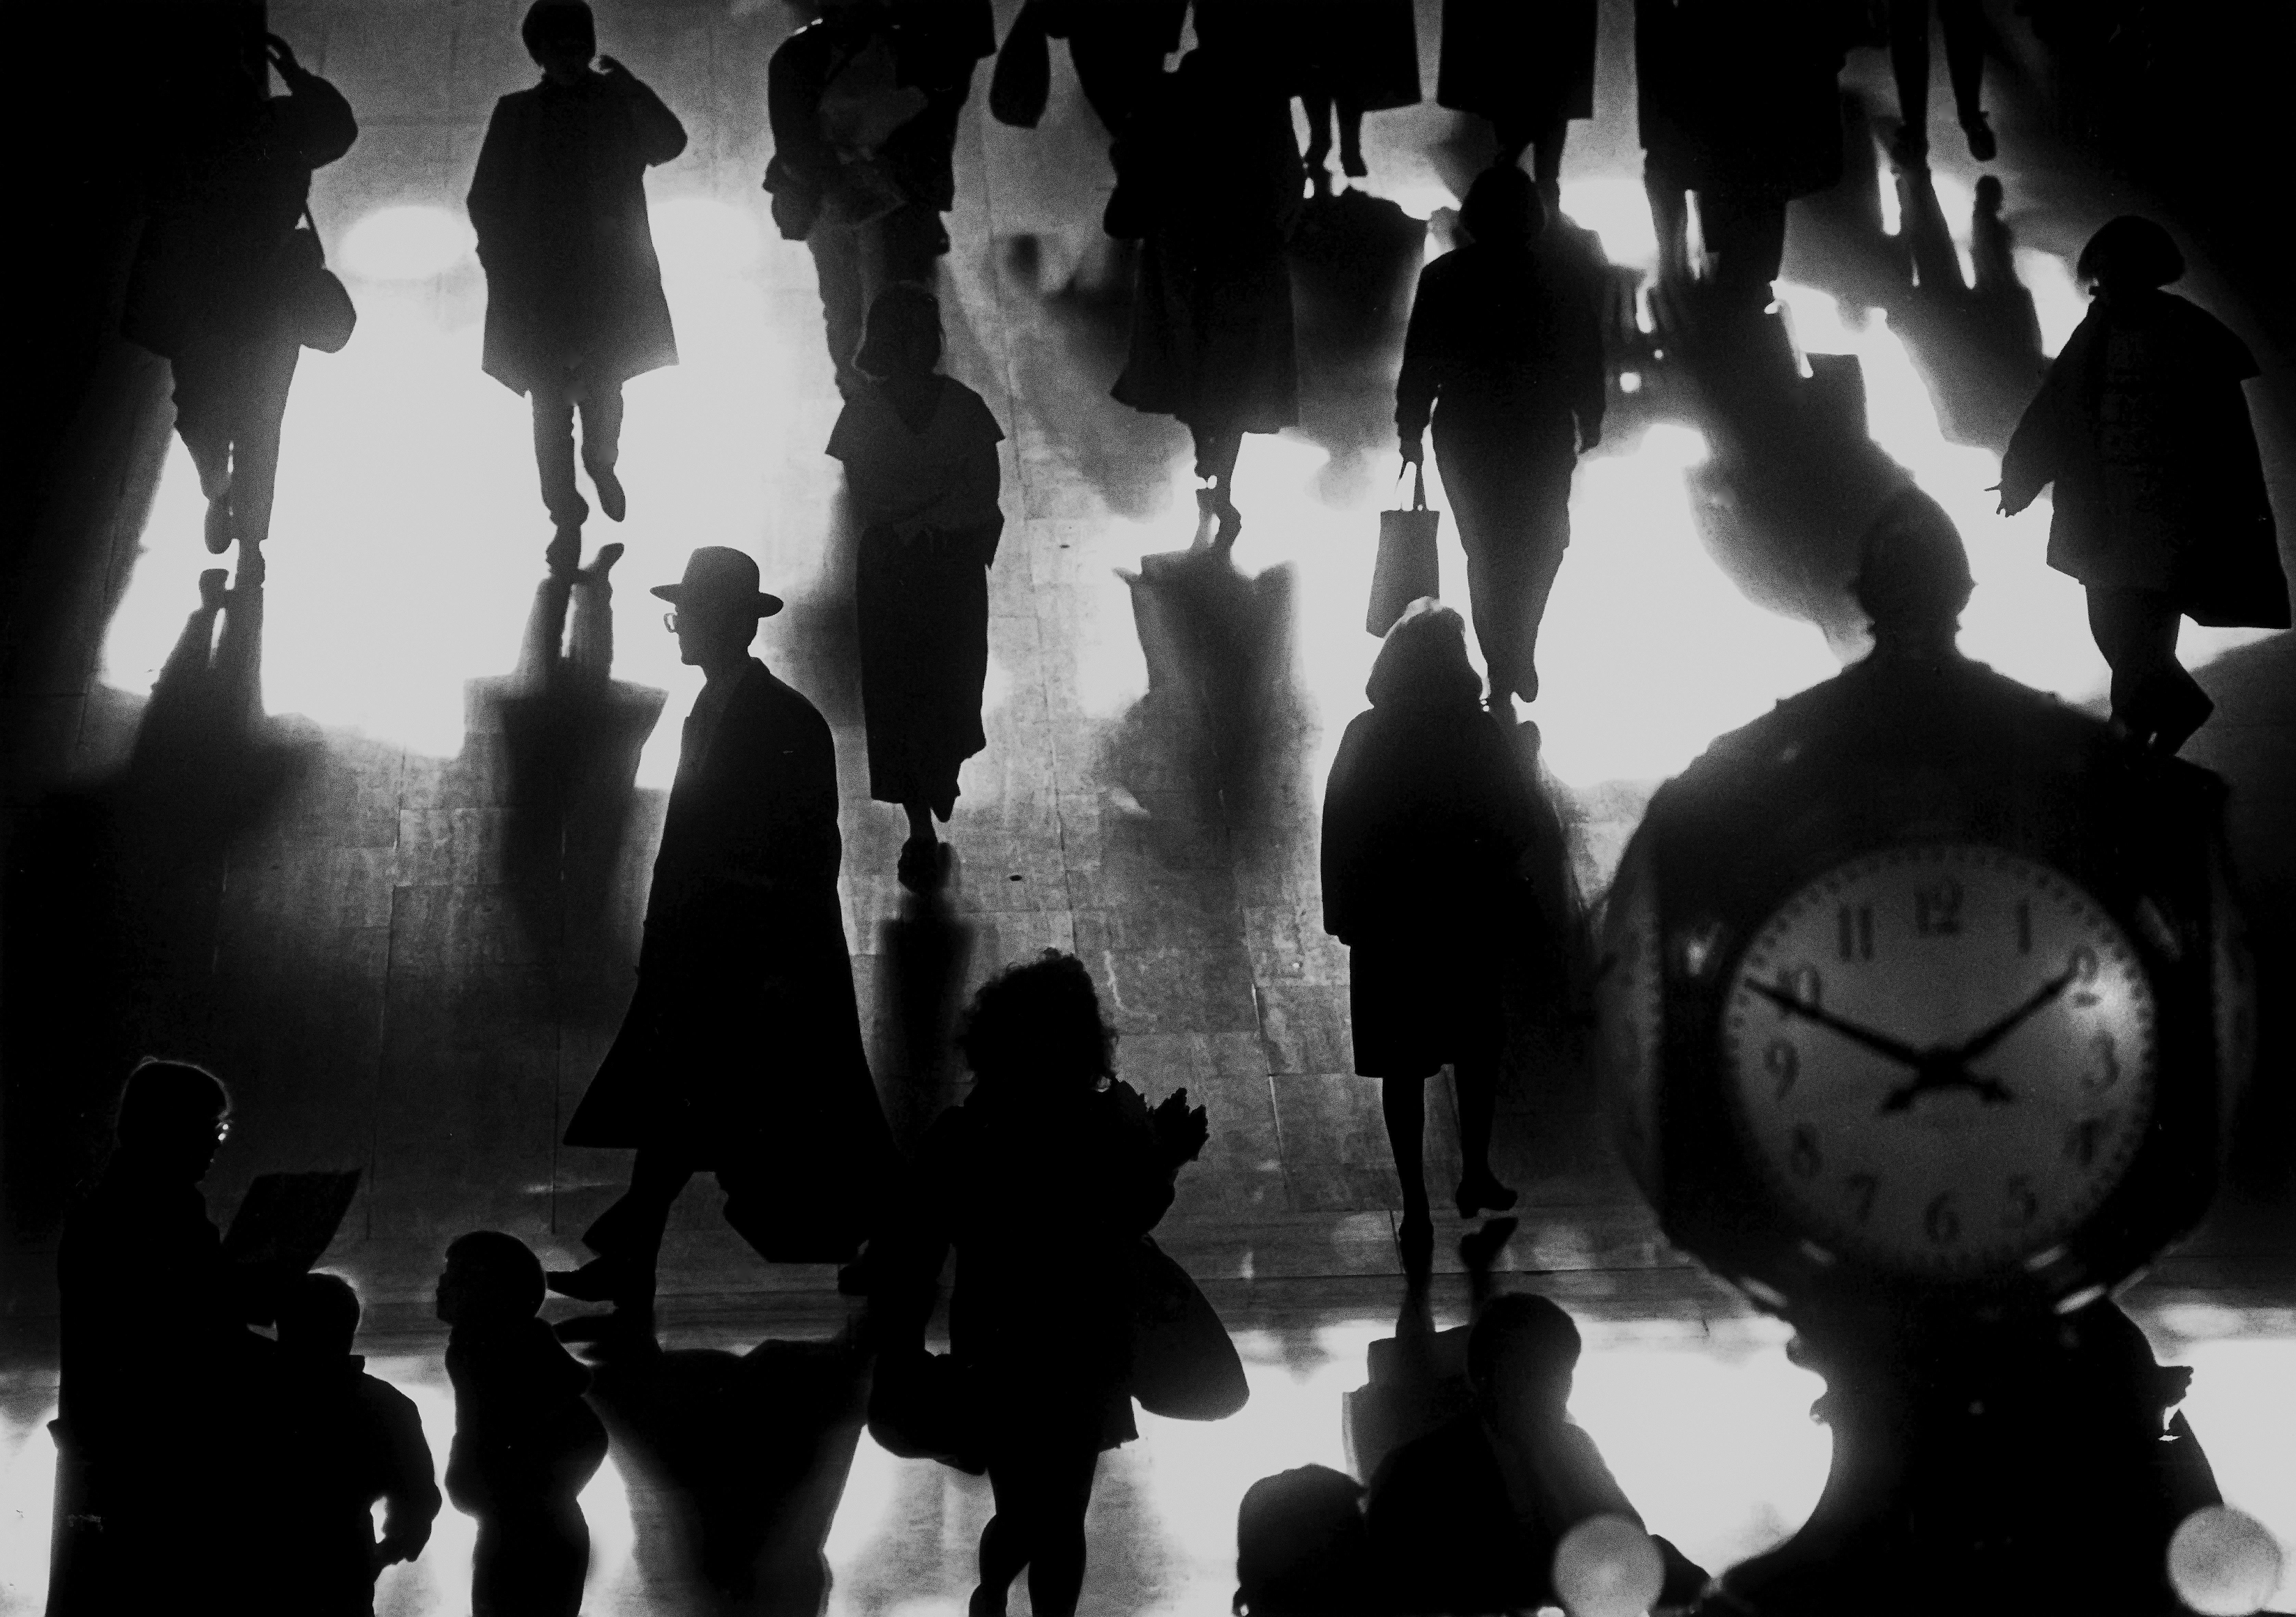 Grand Central Terminal, 1989 Richard Sandler Photography